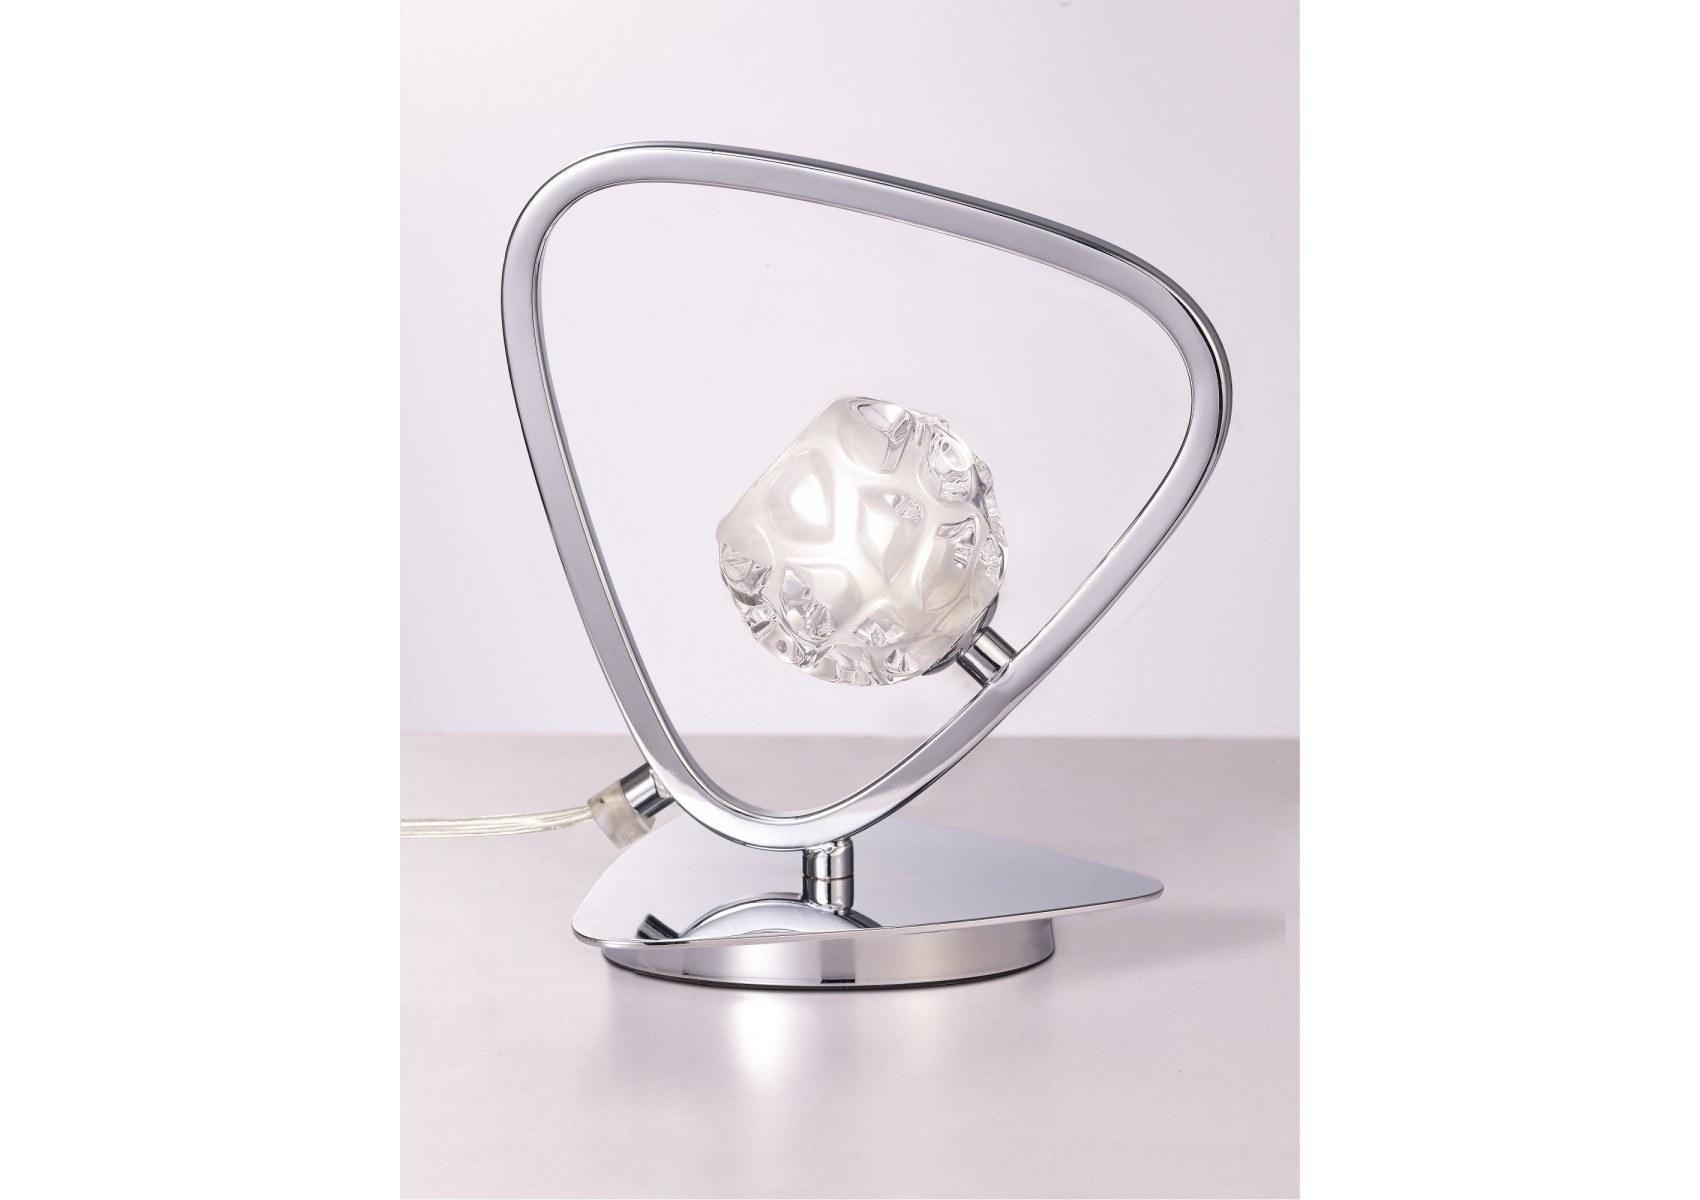 lampe de table design lux boite design. Black Bedroom Furniture Sets. Home Design Ideas